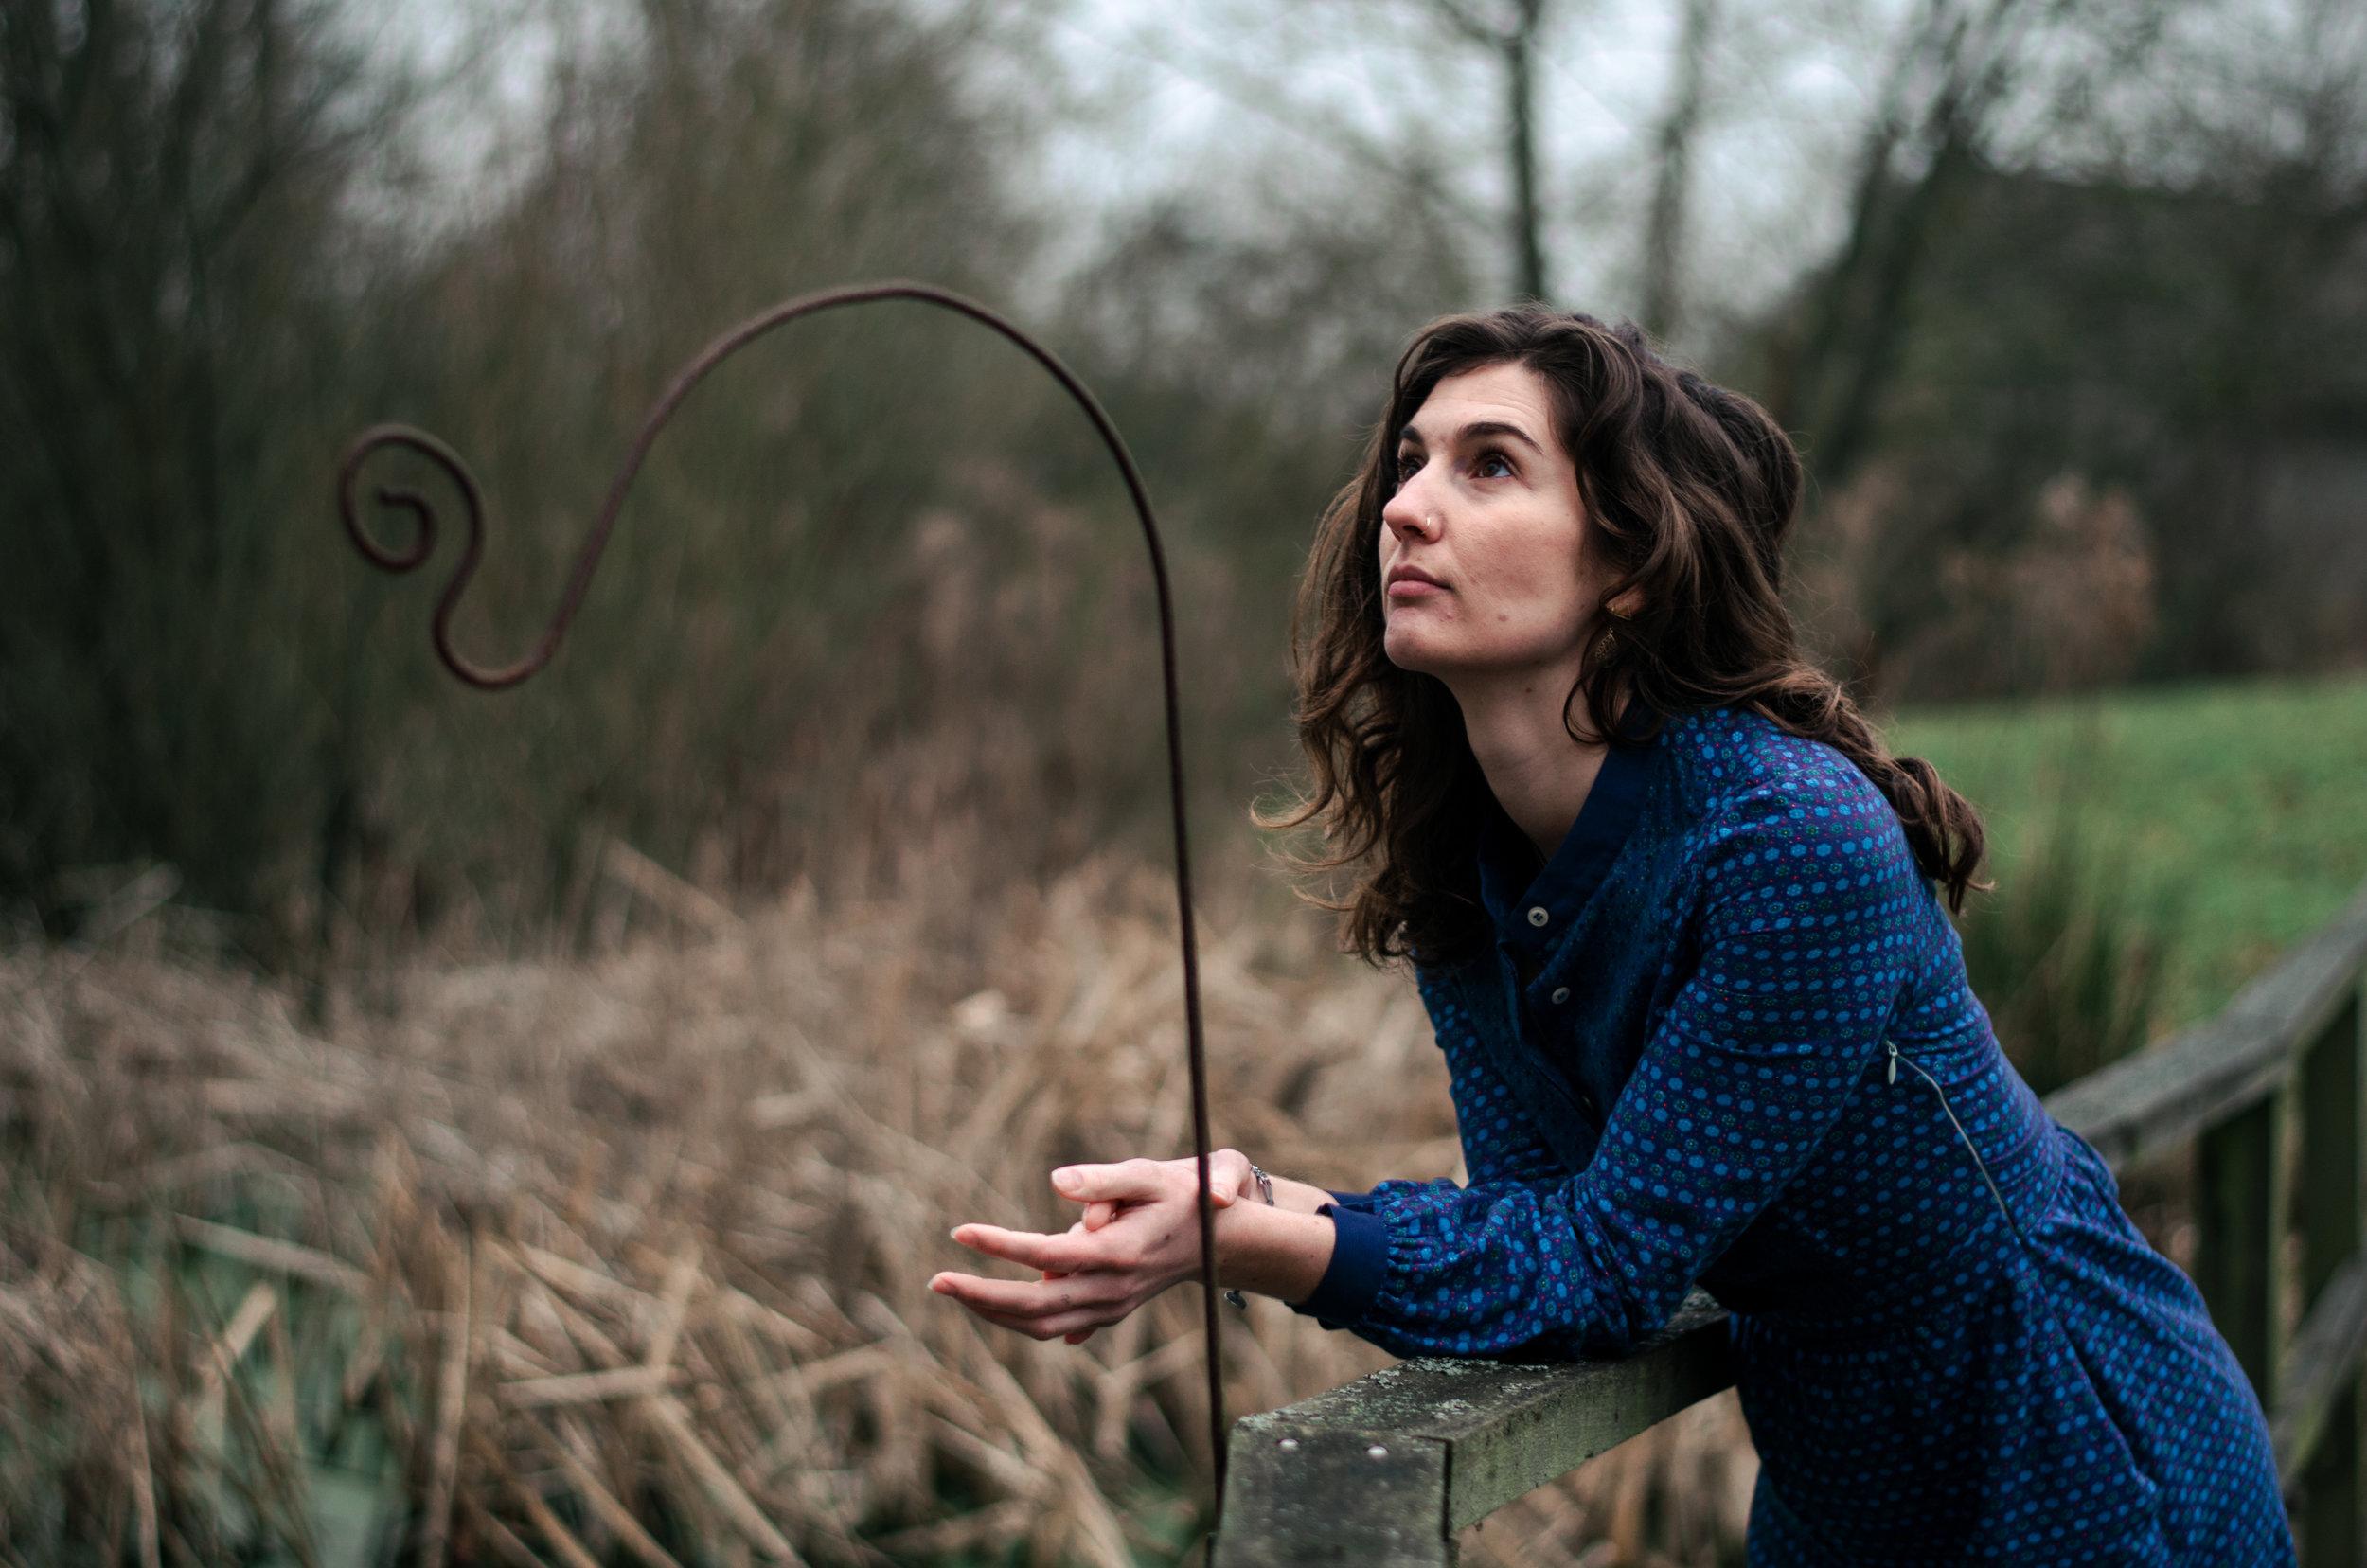 Chloe - Portraits - Aiste Saulyte Photography - 2018-01-05-26.jpg